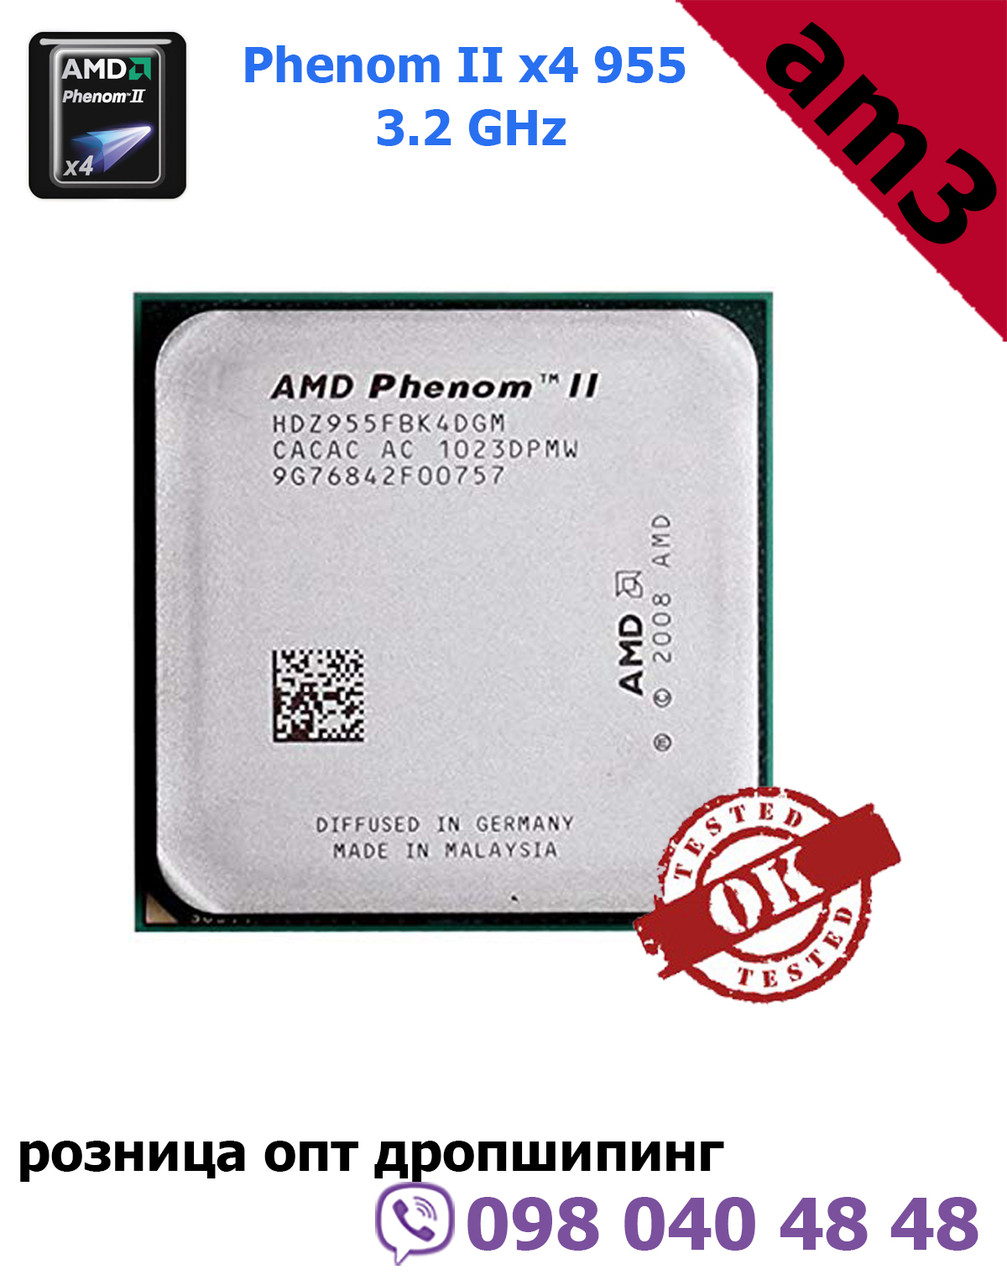 Процессор AMD Phenom II X4 955 (95W), 4 ядра, 3.2 ГГц, AM3 купить в интернет магазине